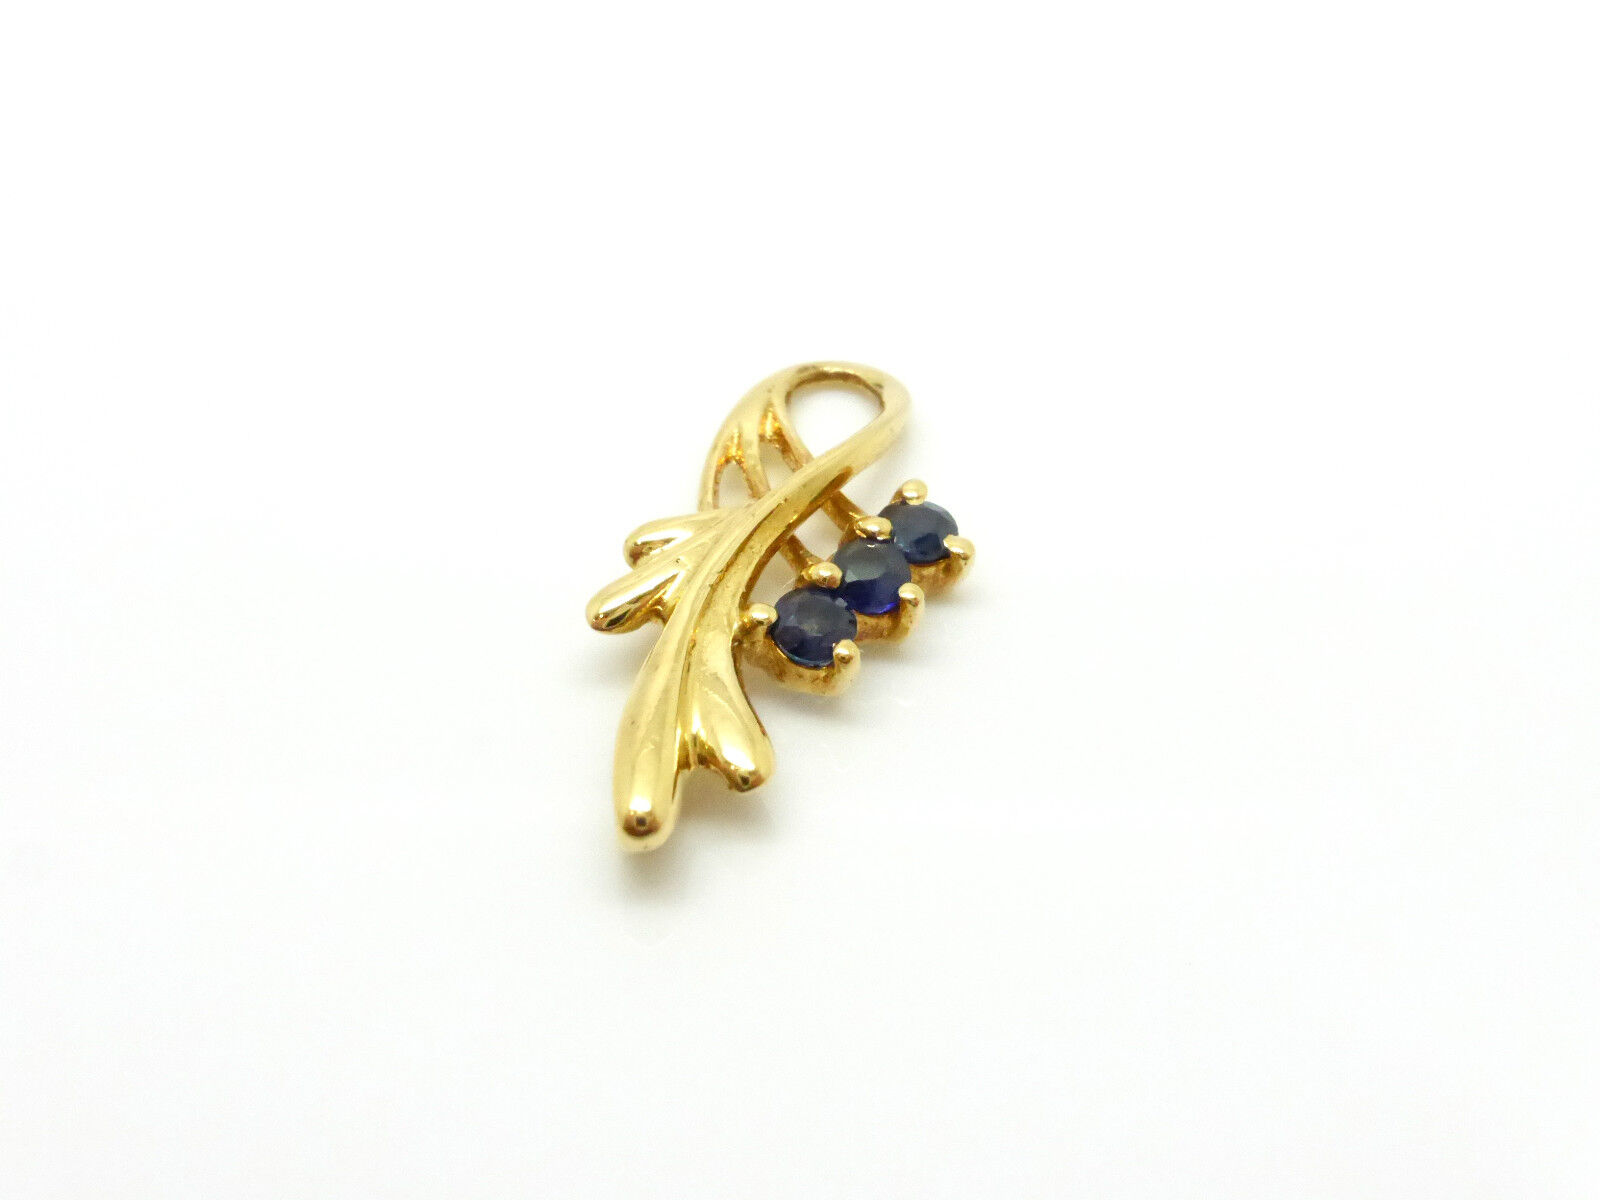 Pendant 18k Yellow gold 750 000 3 Sapphires 0.15 Carat 0.0212oz